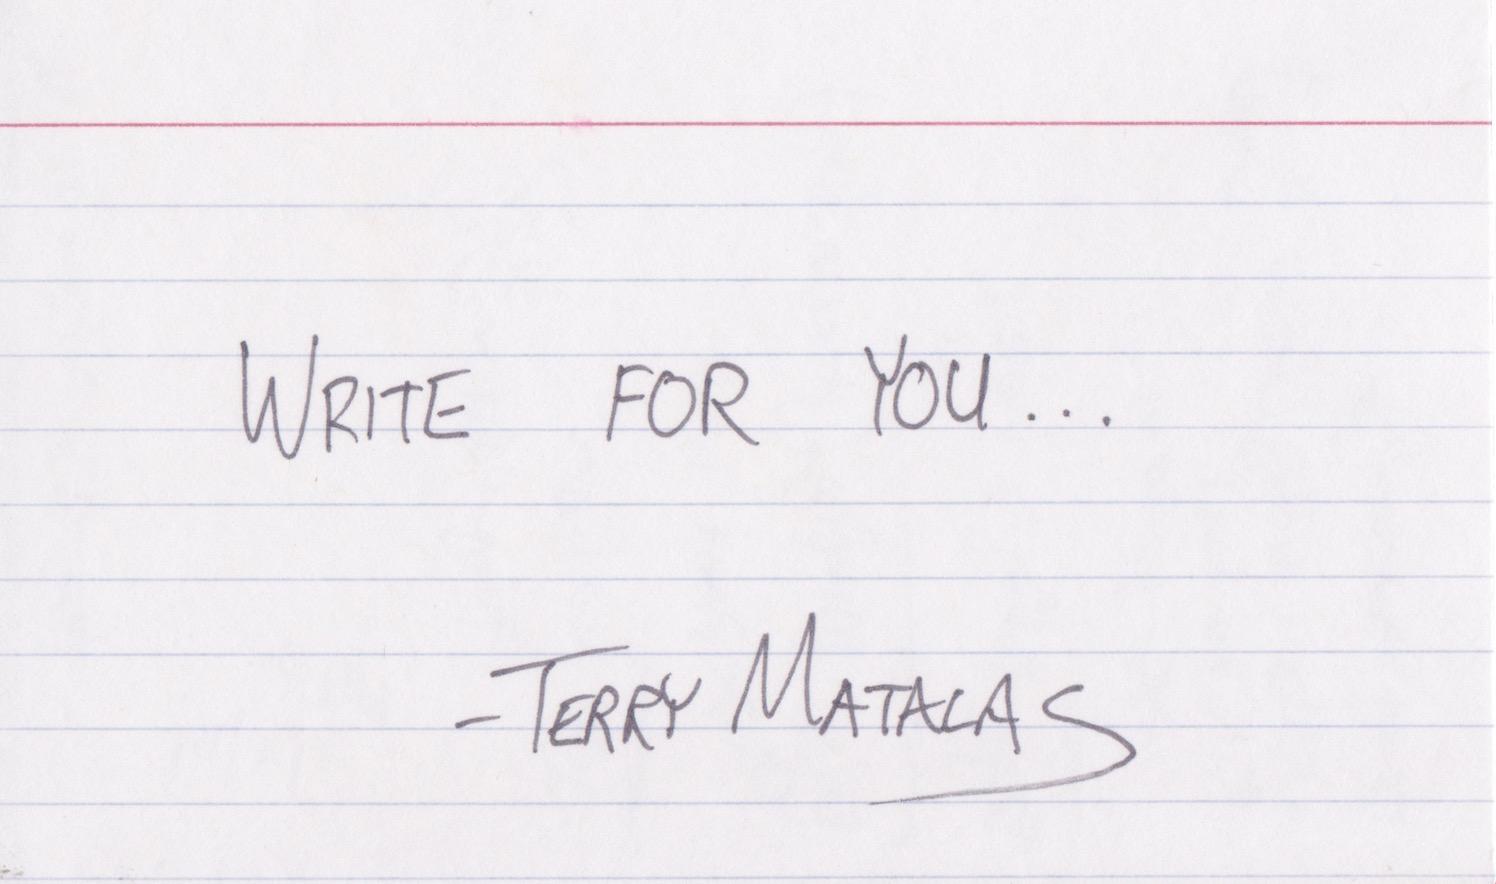 Terry Matalas